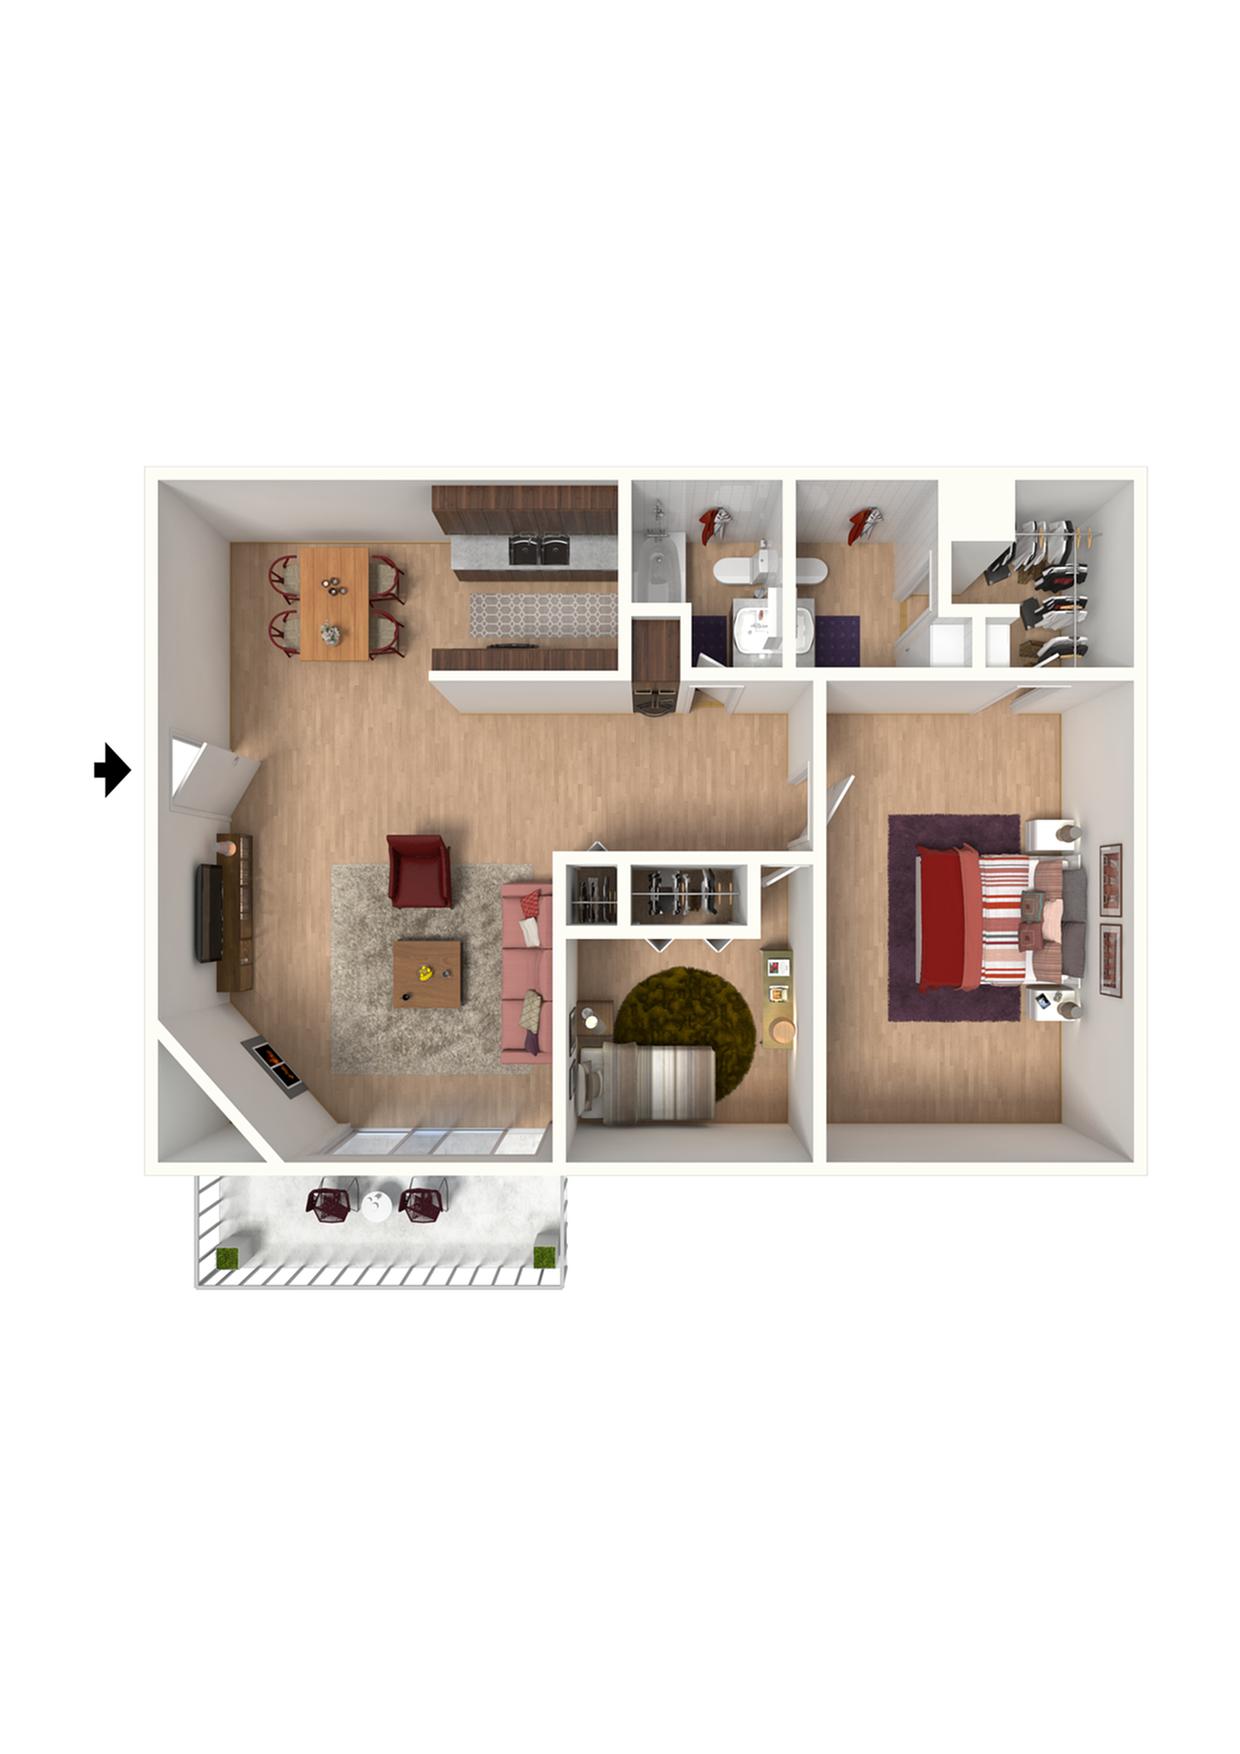 B2 Floorplan: 2 Bedroom, 2 Bathroom - 960 sqft